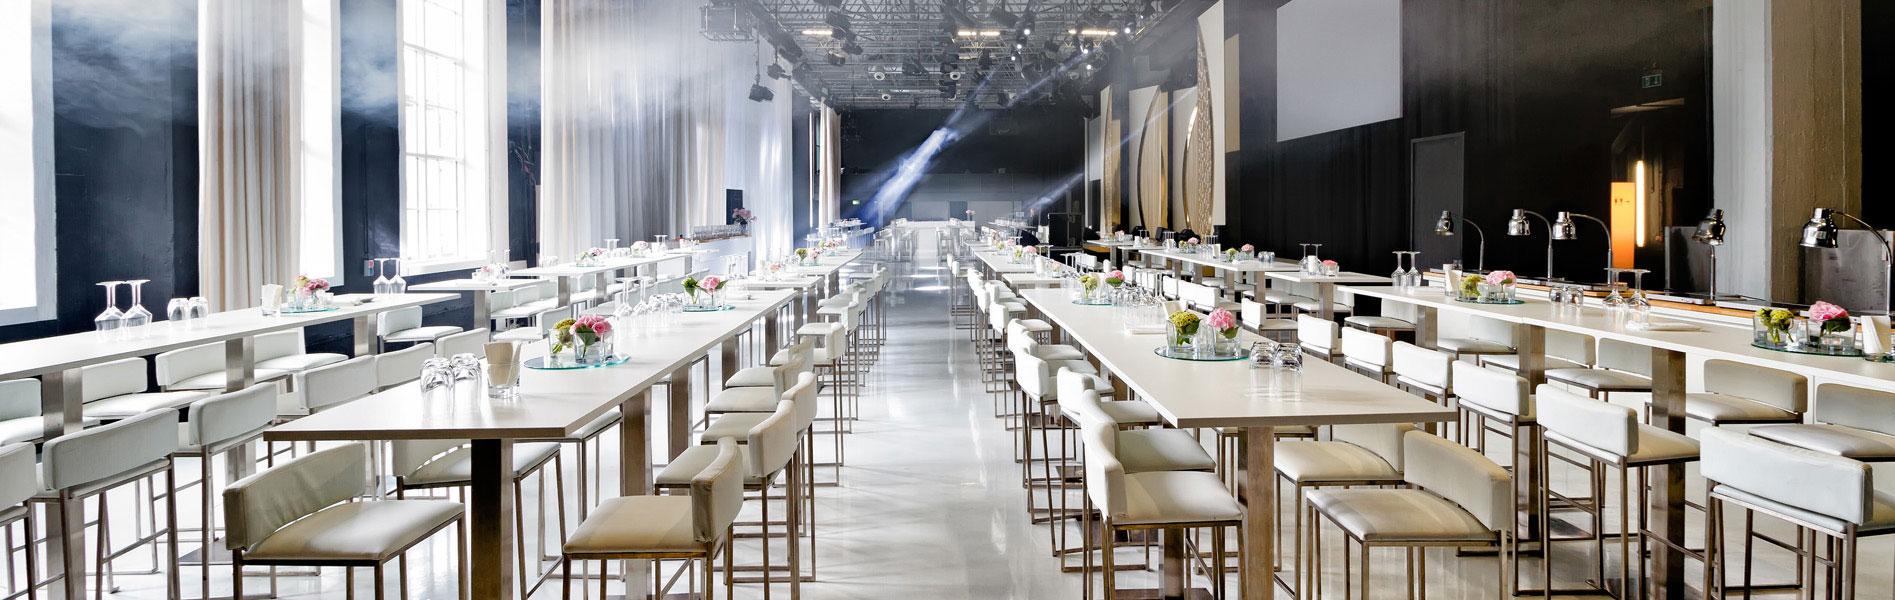 Loungemobiliar München - Unikorn Catering & Events